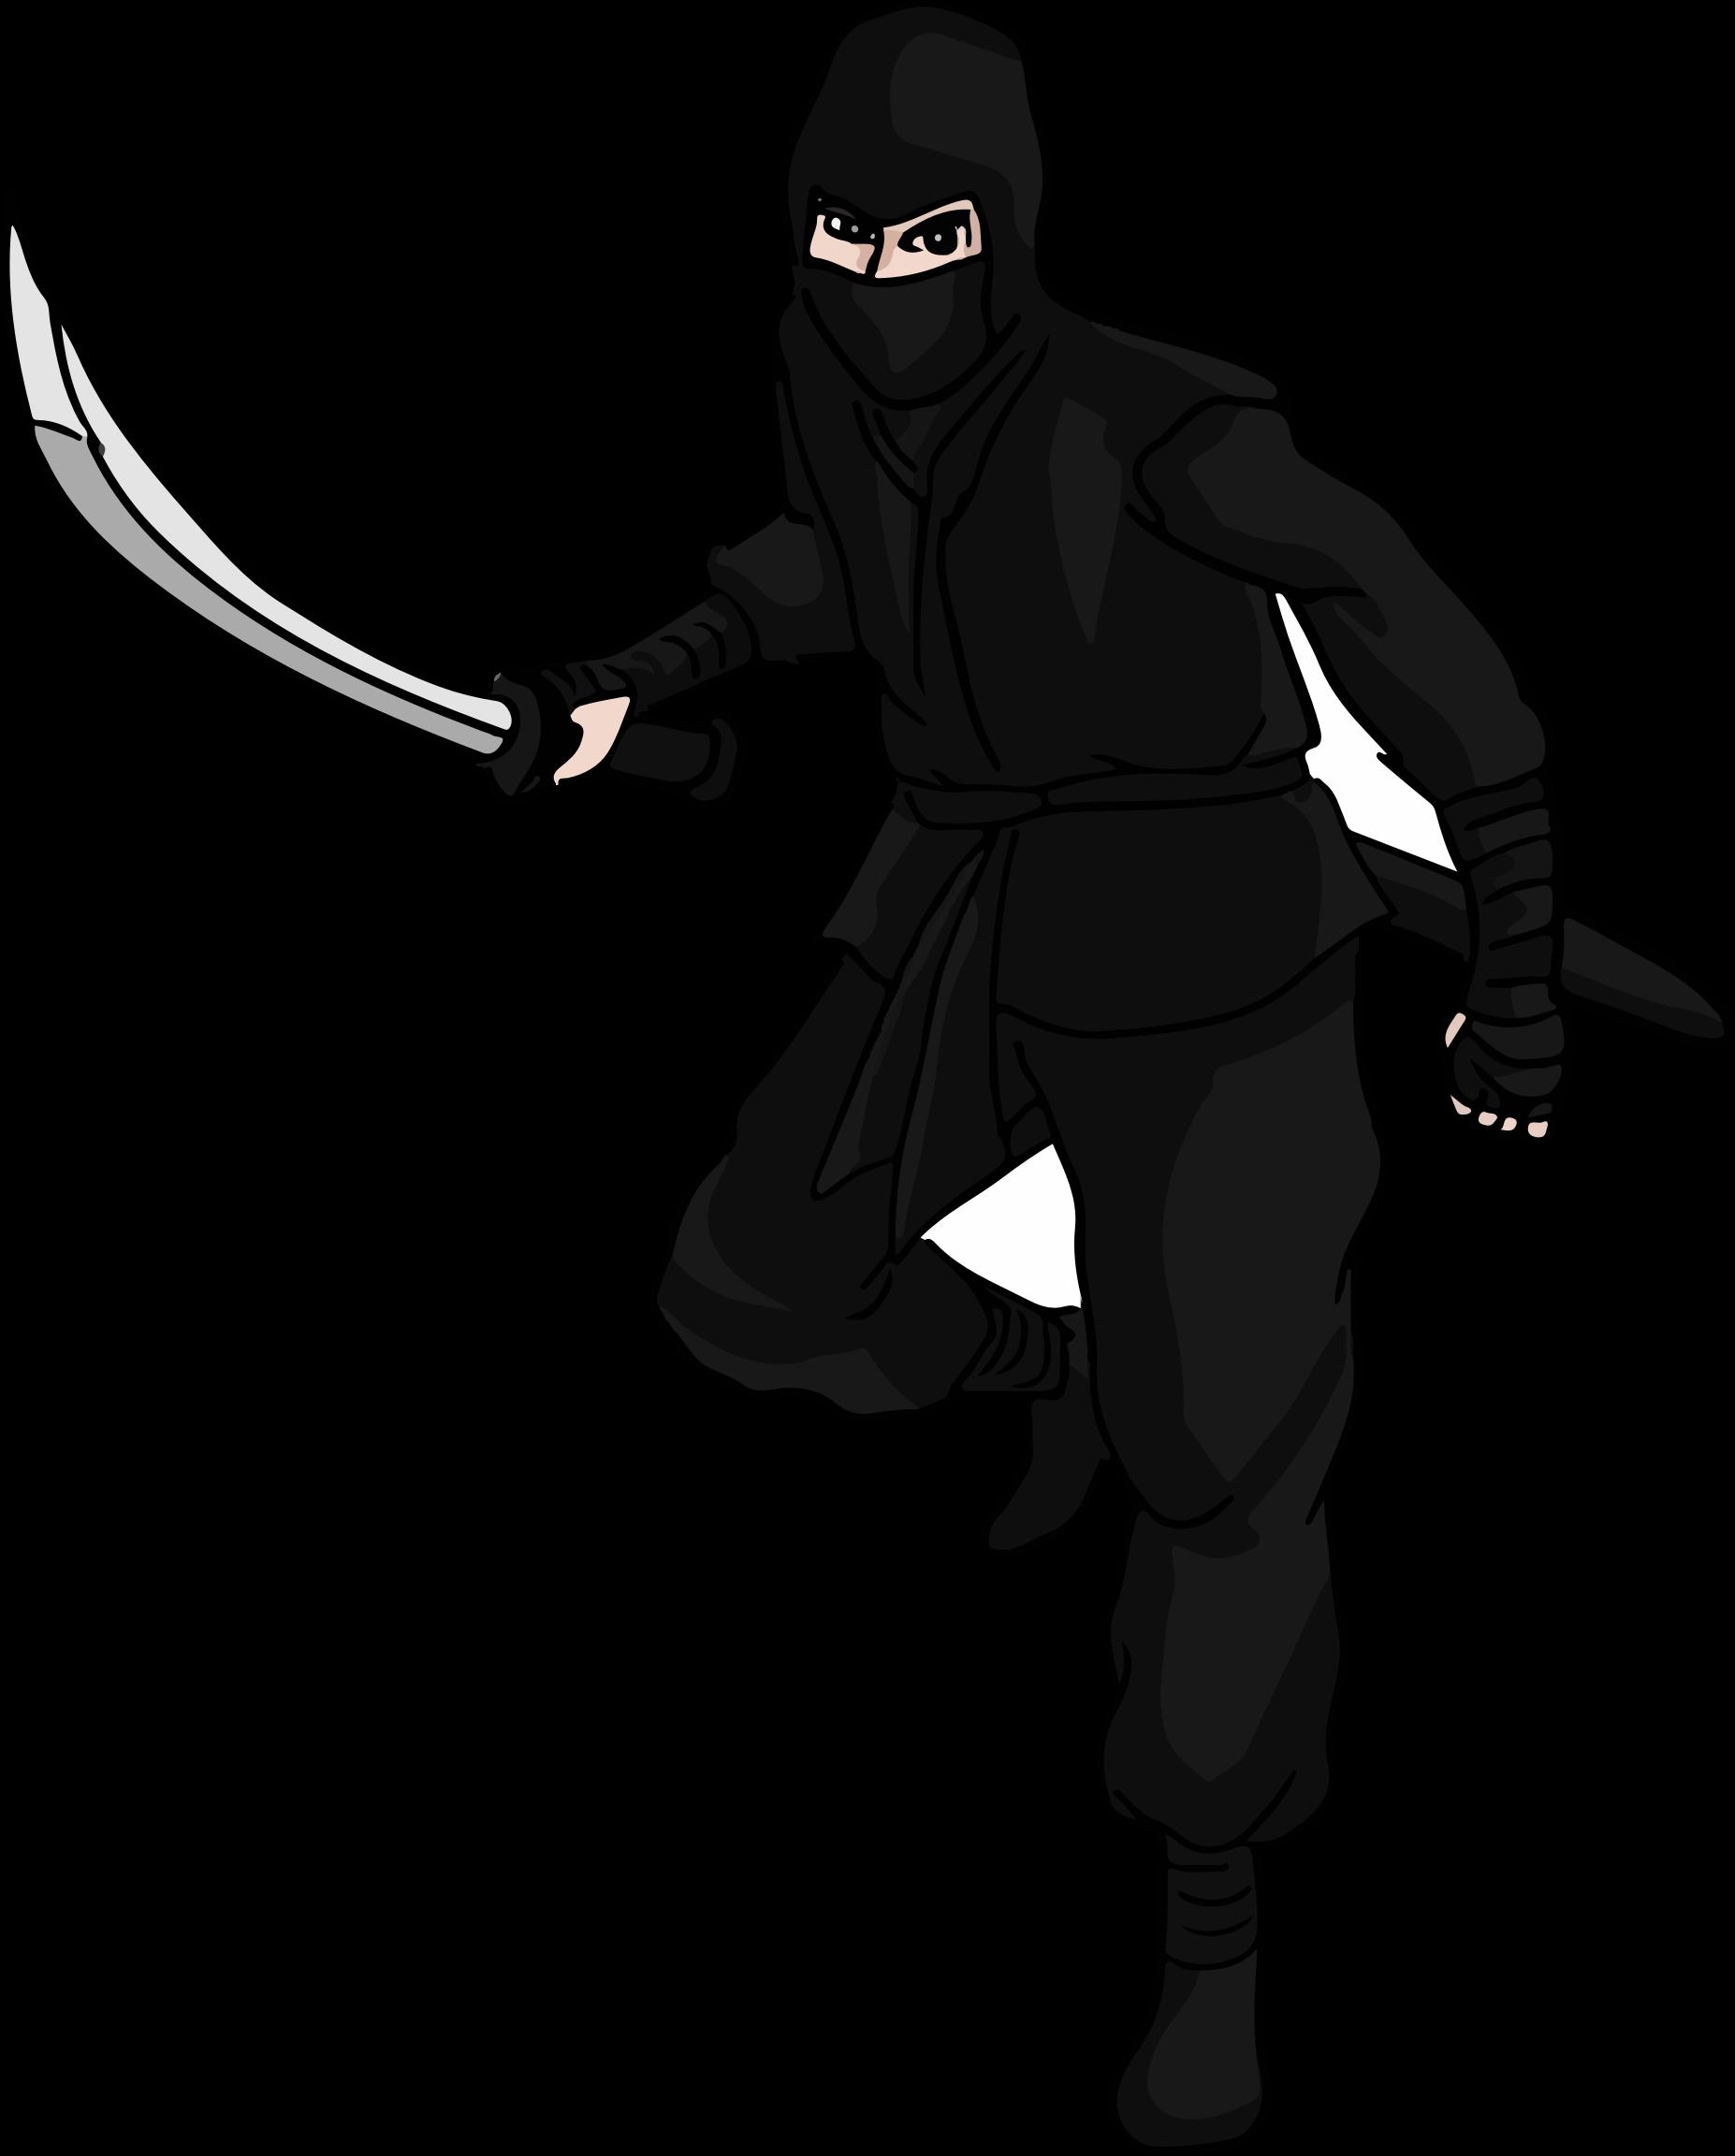 Ninja star clipart svg free download Ninja - Lessons - Tes Teach svg free download